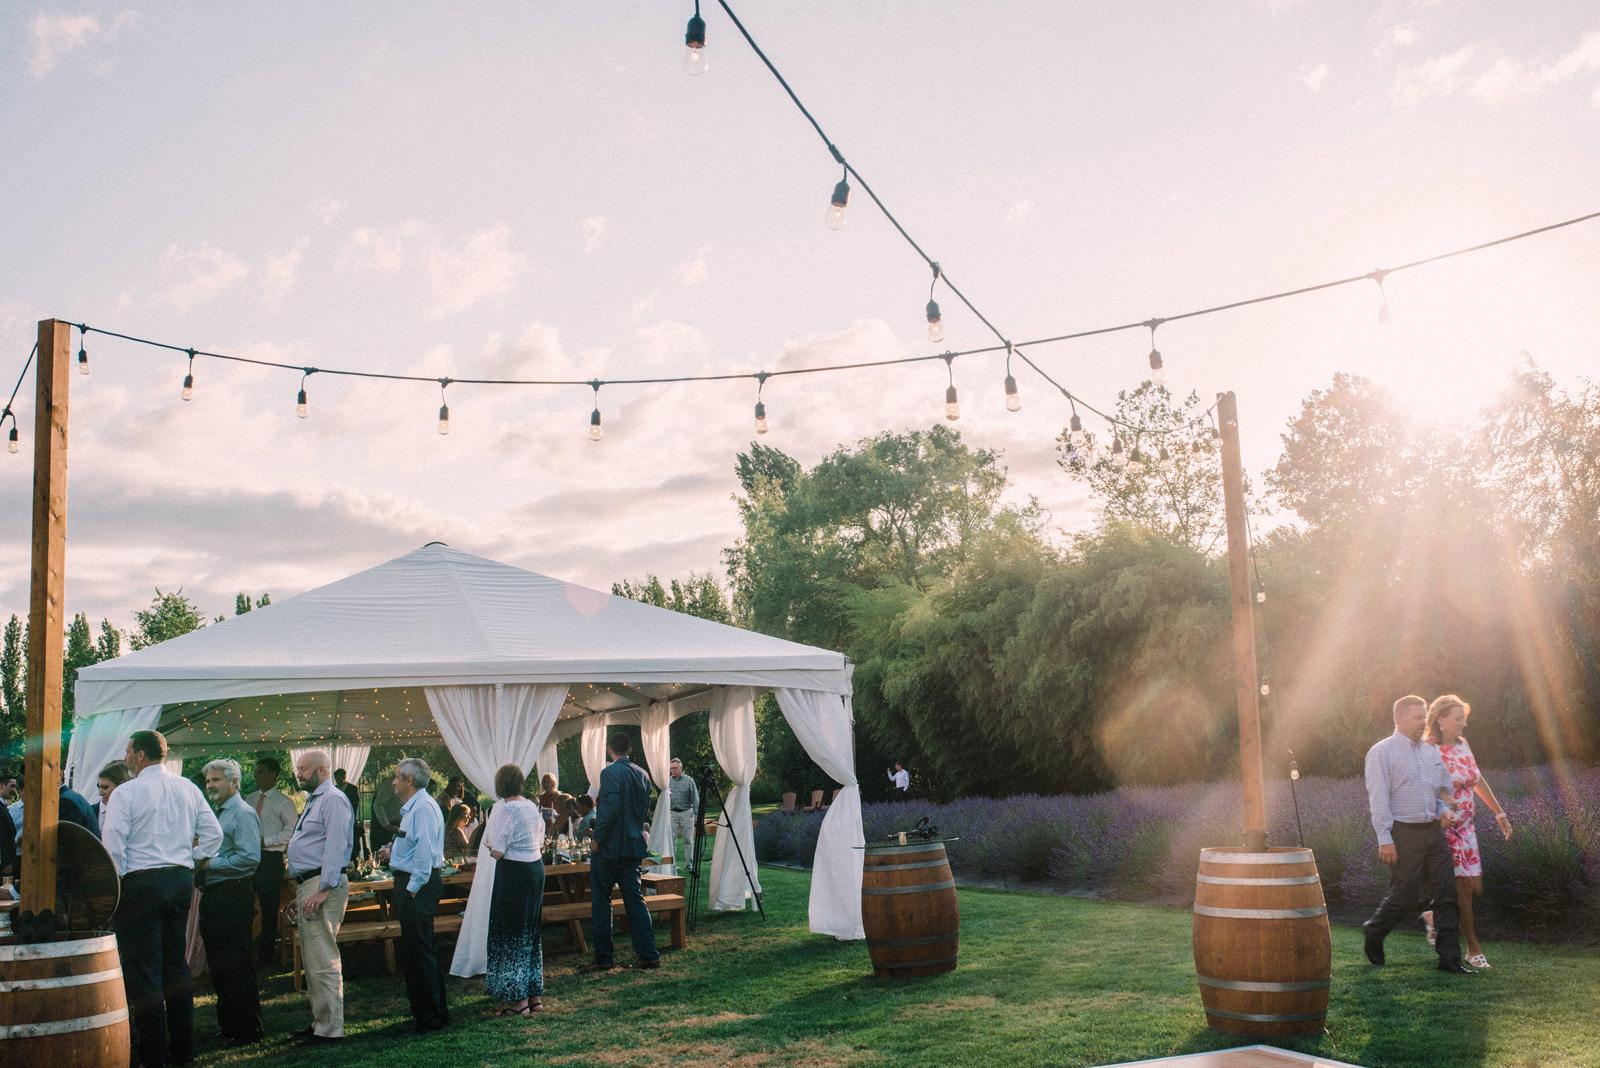 073-woodinville-lavendar-farm-wedding-with-golden-glowy-photos.jpg